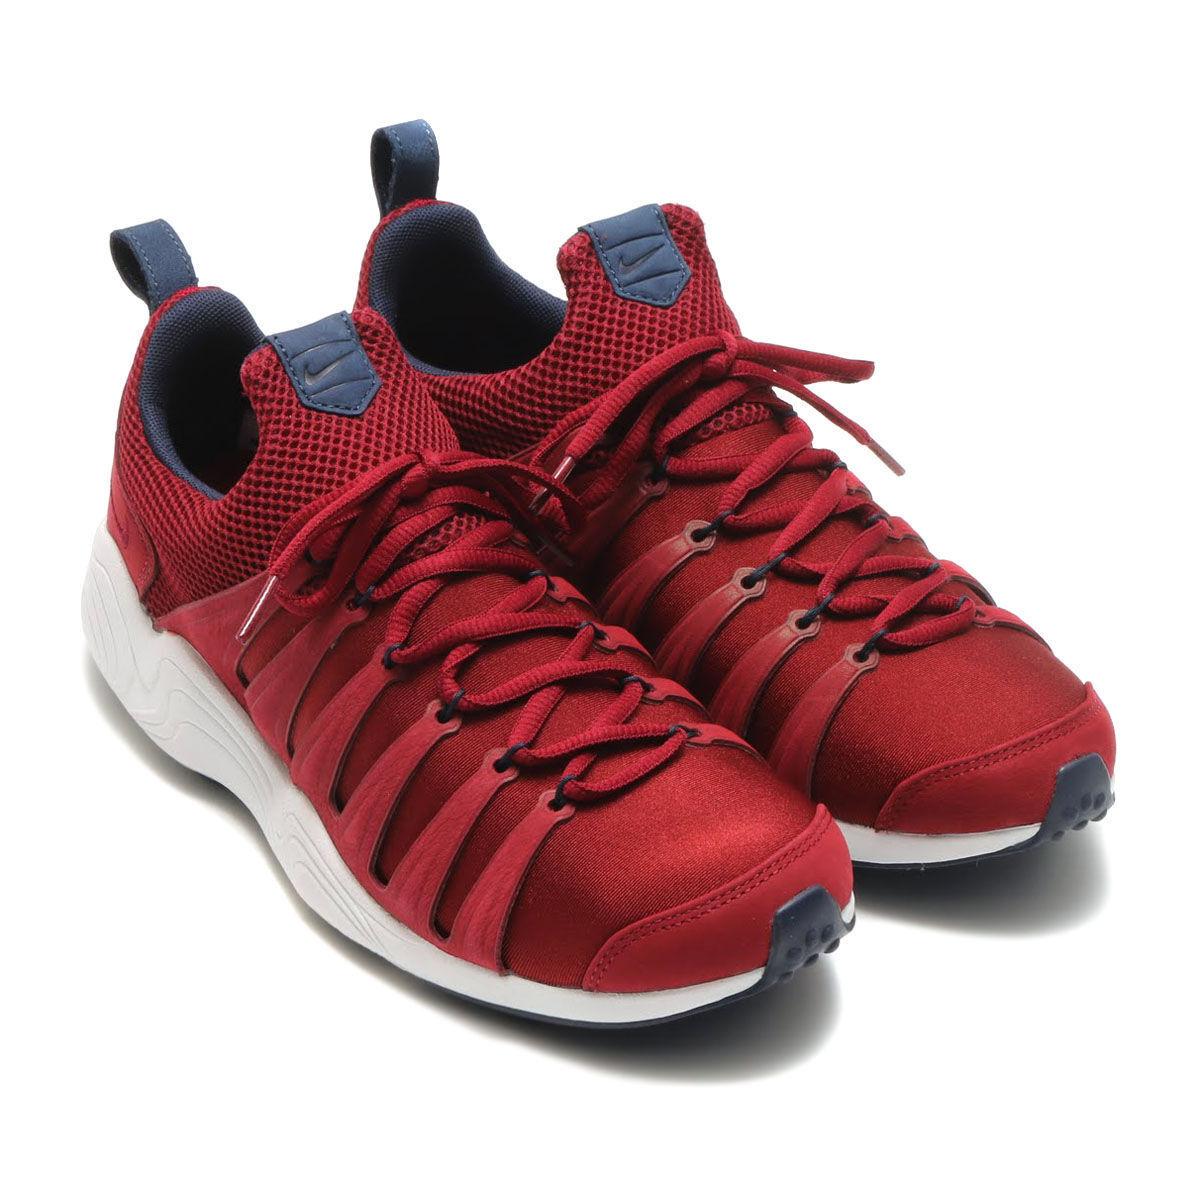 NikeLab Air Zoom spirimic EUR 38.5 Scarpe Da Ginnastica Squadra Rosso Corsa 881983 600